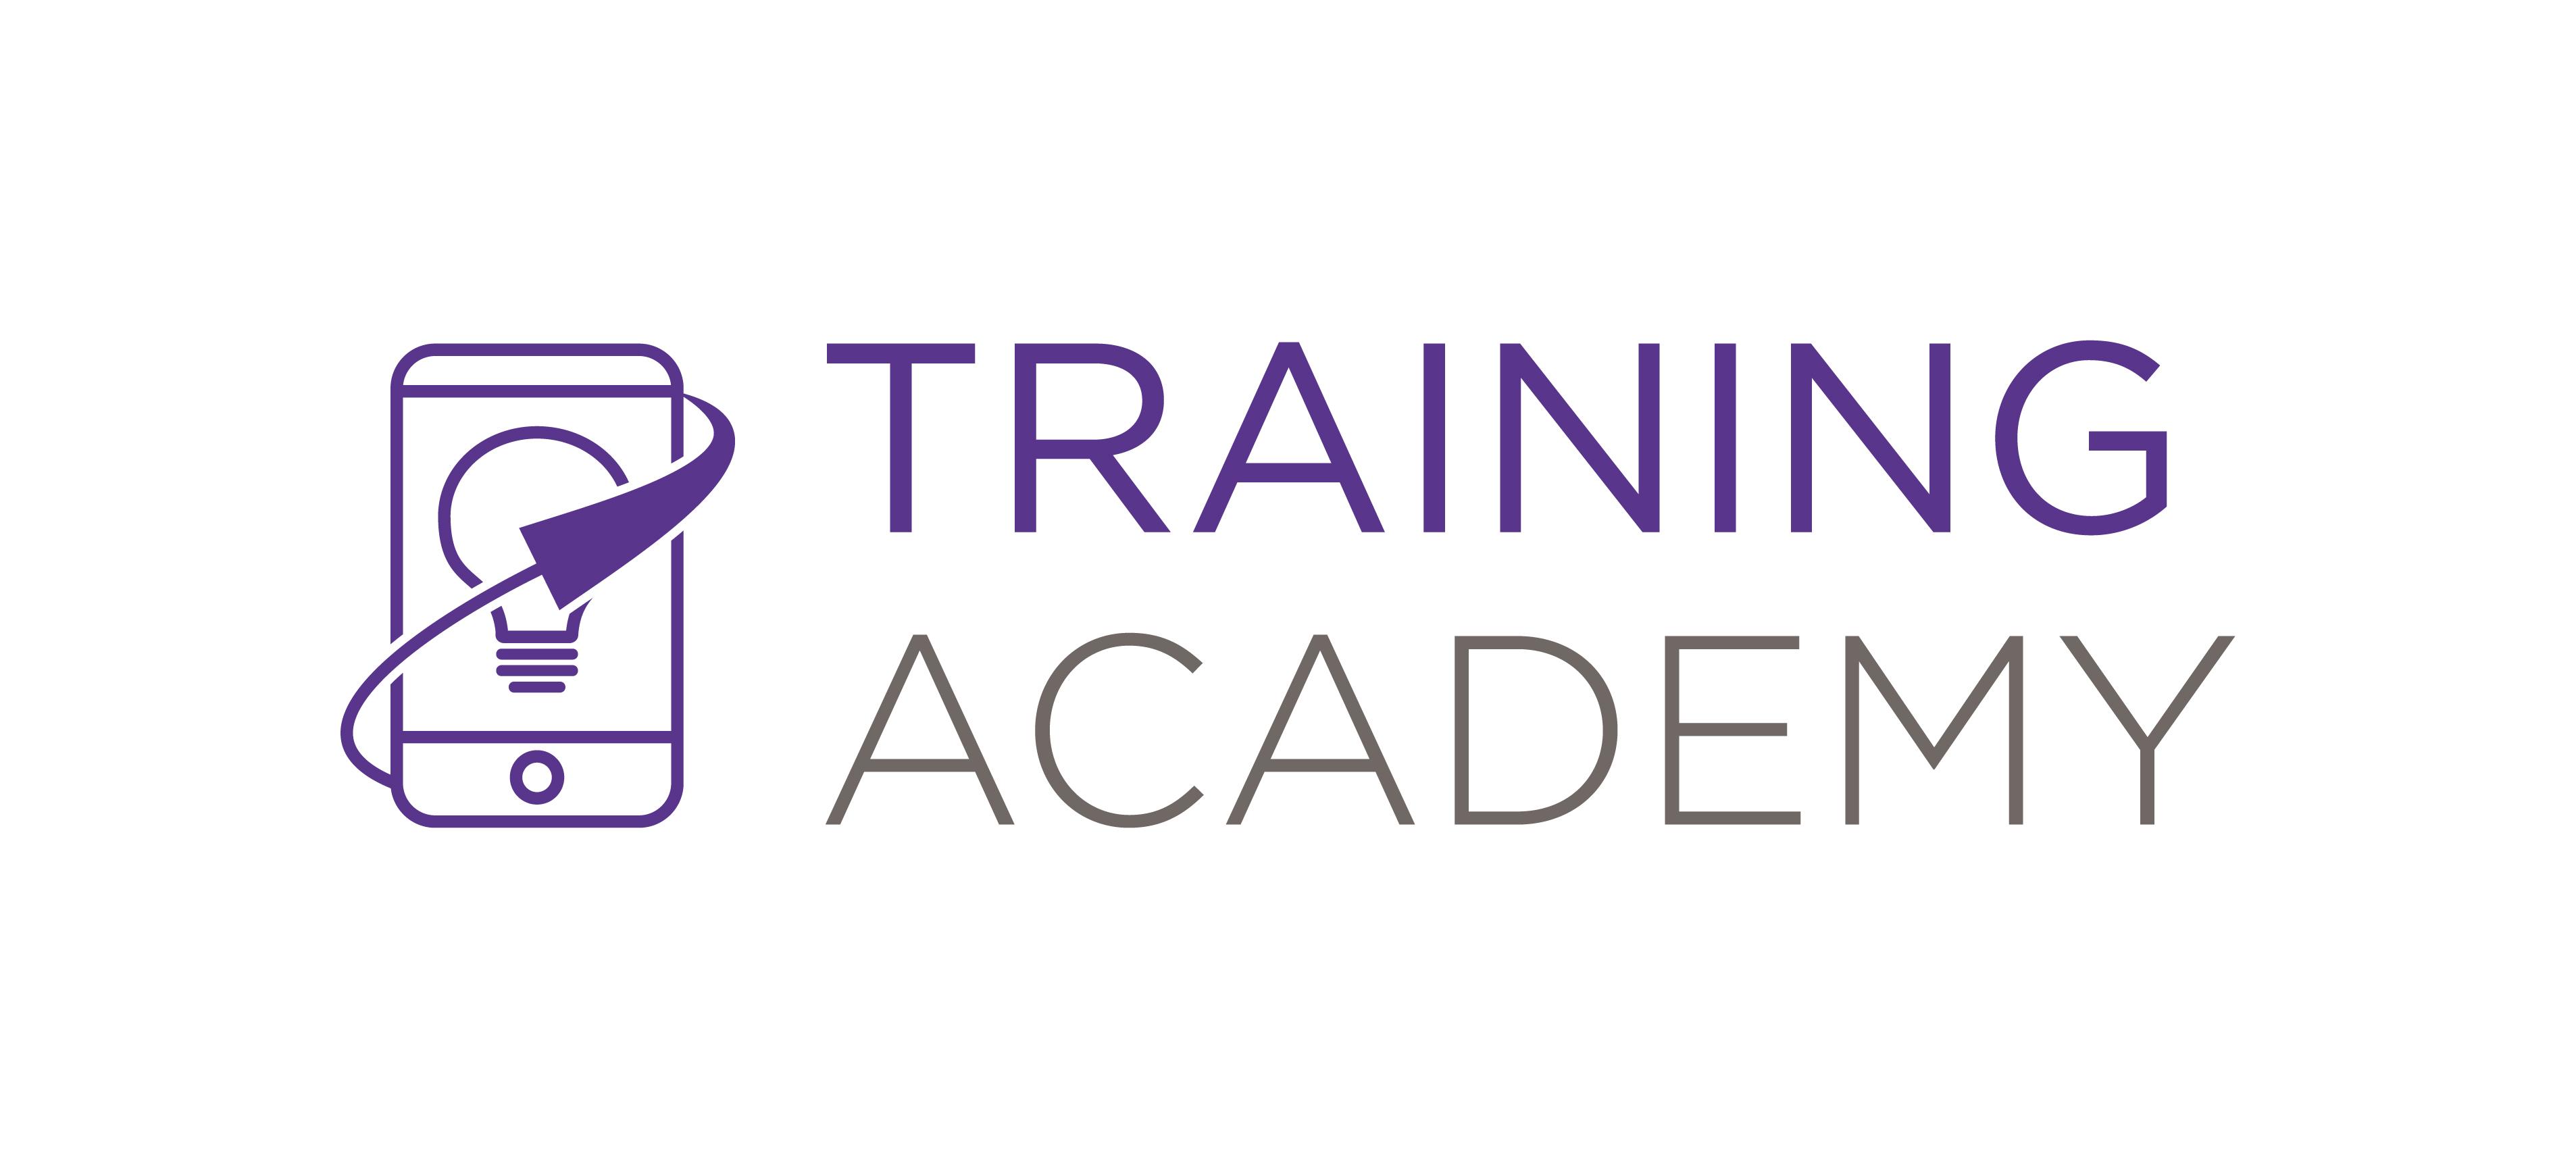 Training academy logo-01